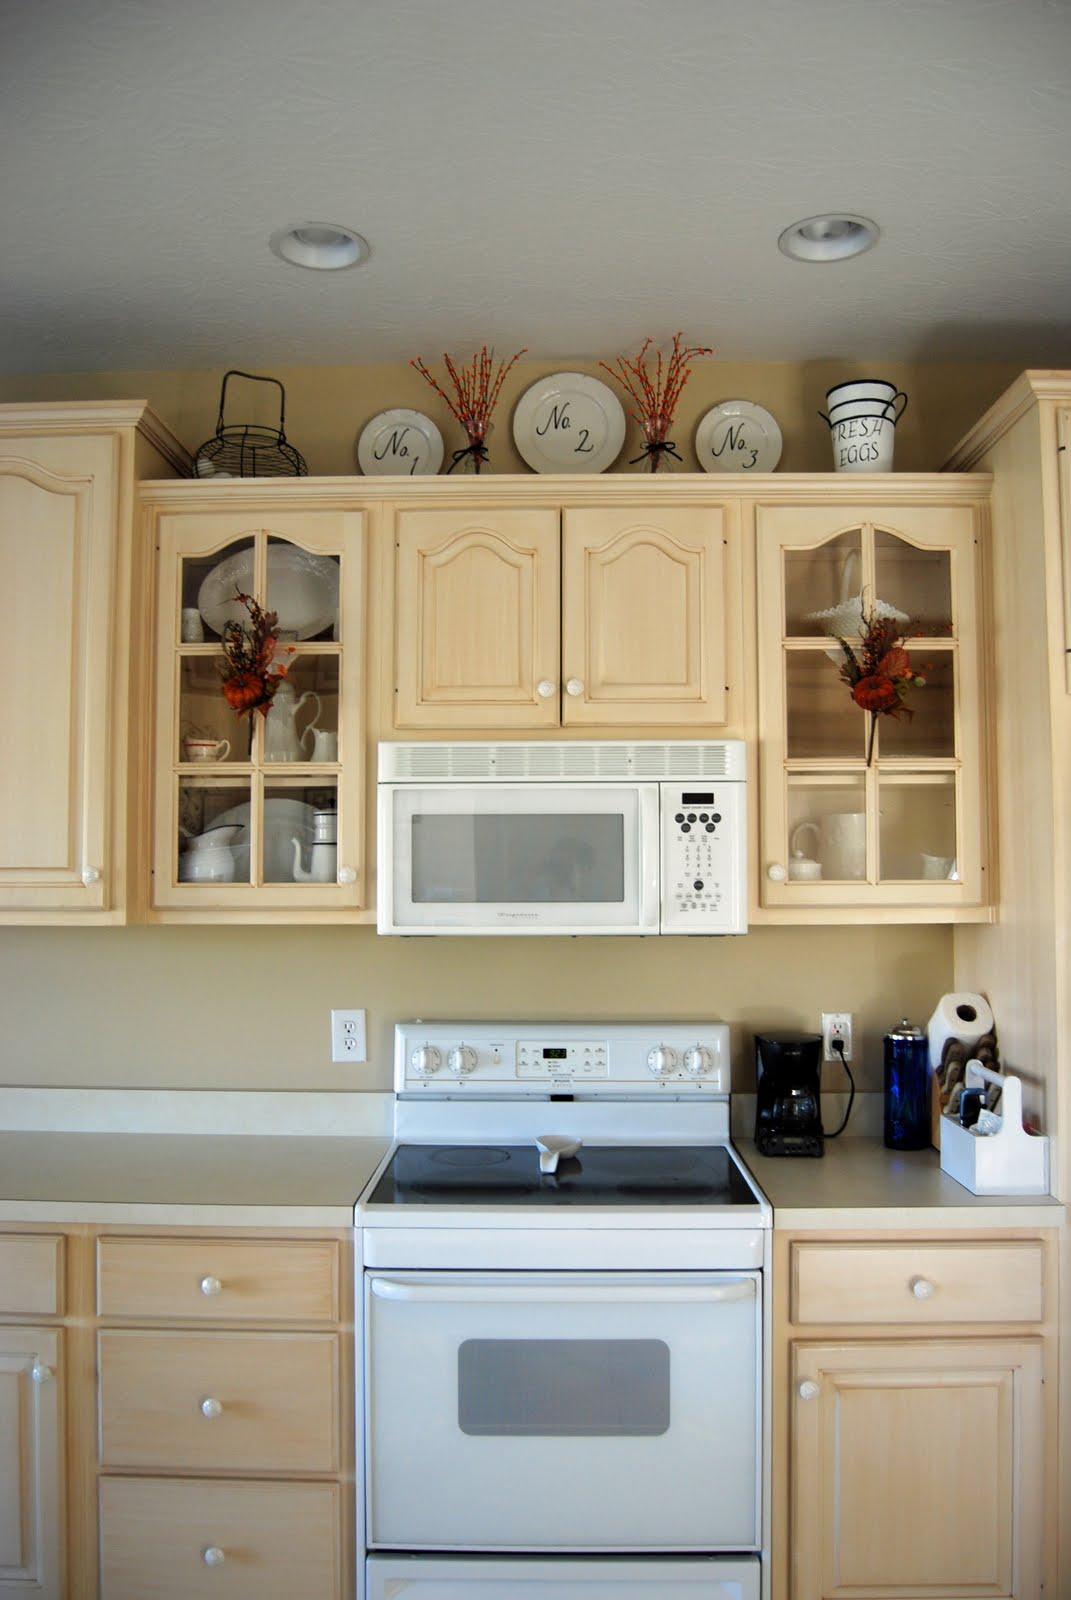 decoration kitchen cabinet images luxury interior decoration ideas kitchen cabinet tops decorate kitchen cabinet tops